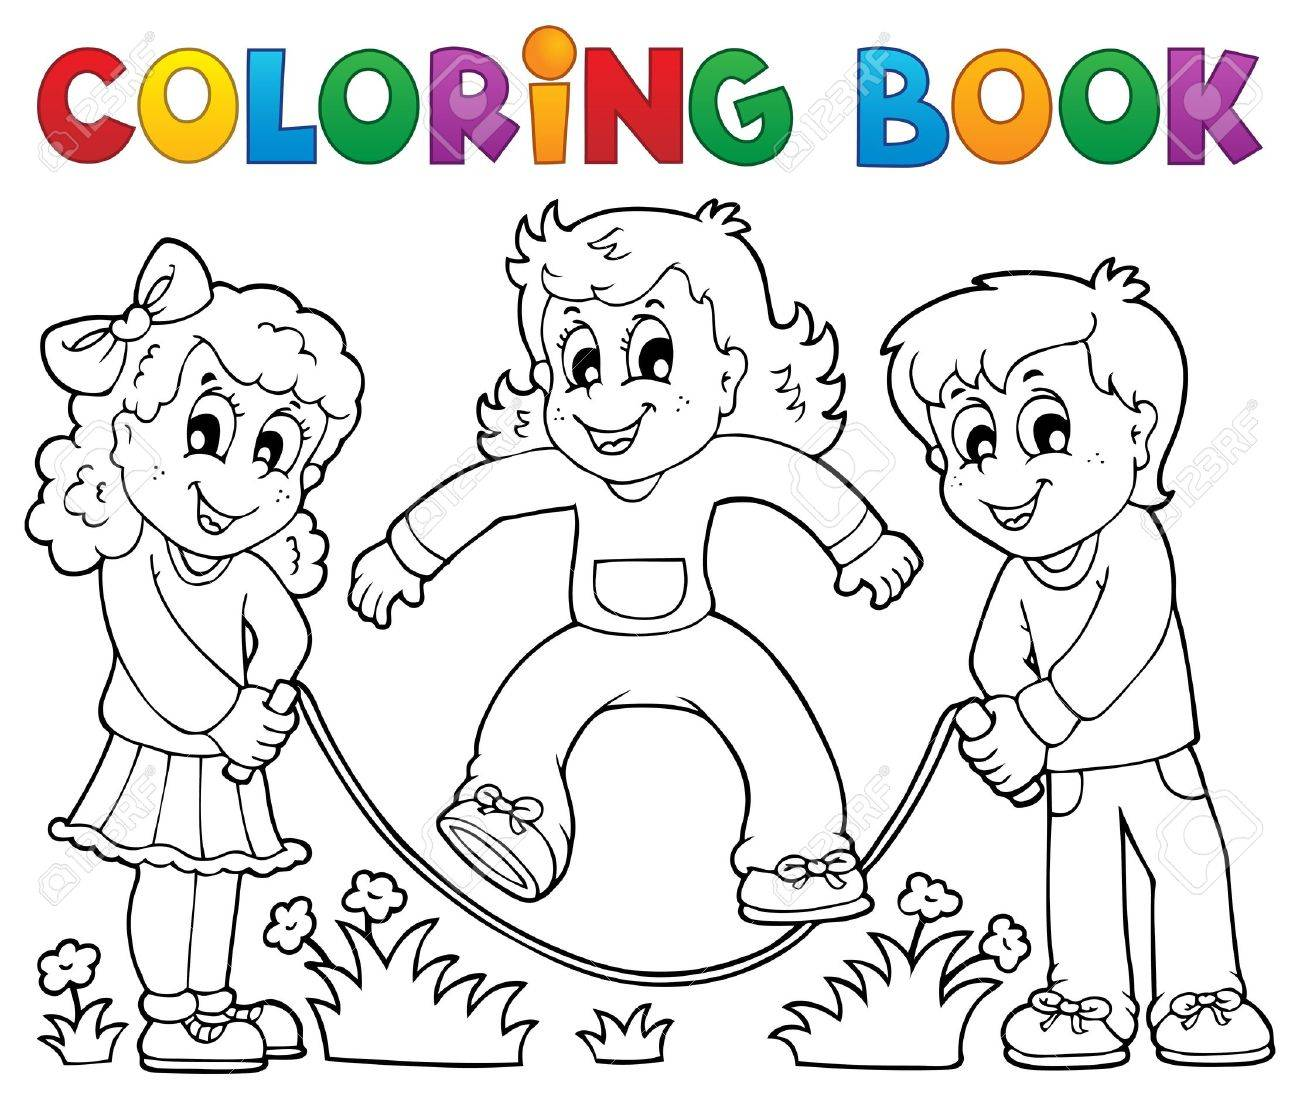 Kids coloring book - Coloring Book Kids Coloring Book